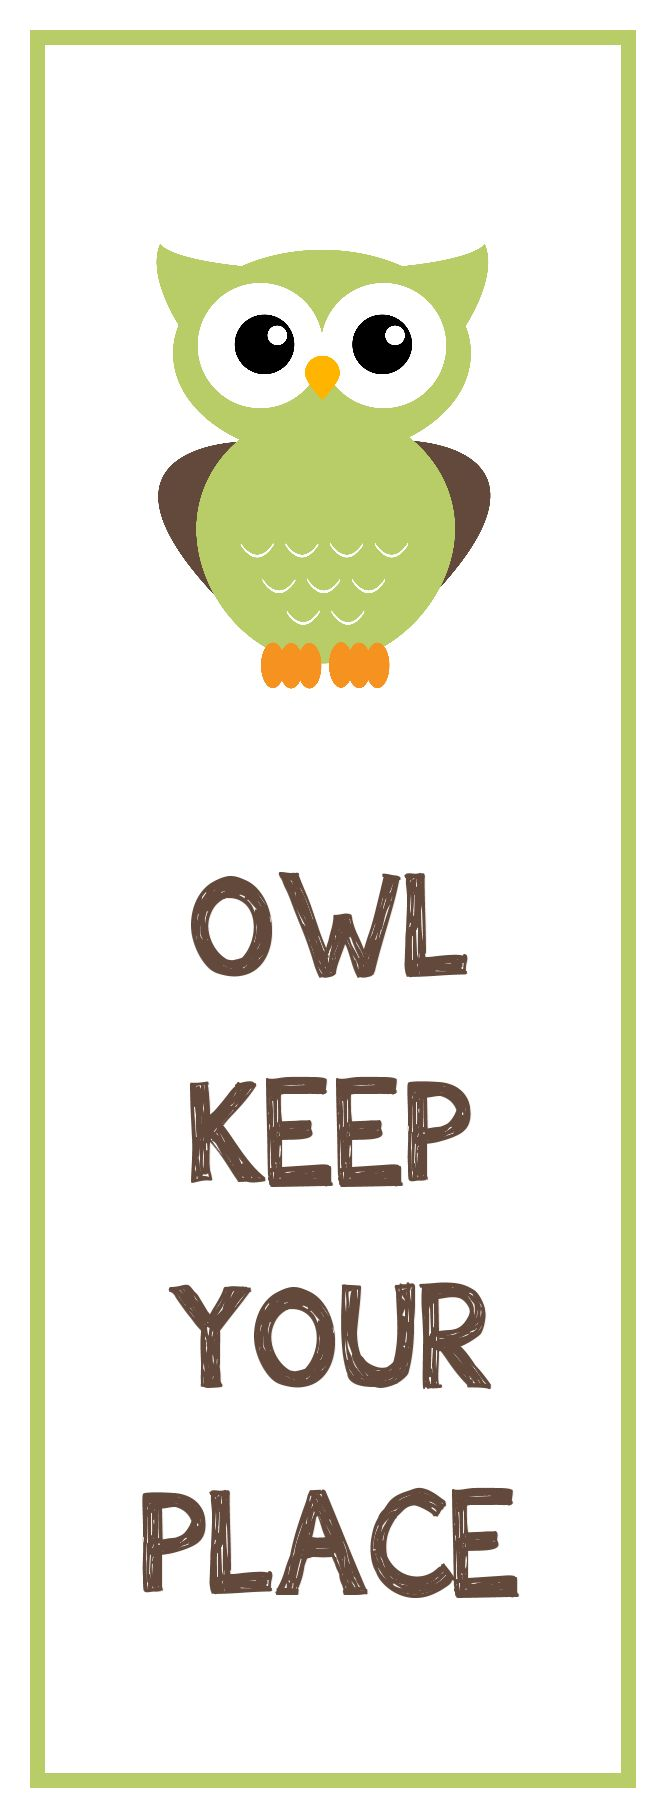 Green Owl - free printable bookmark in various colourways.